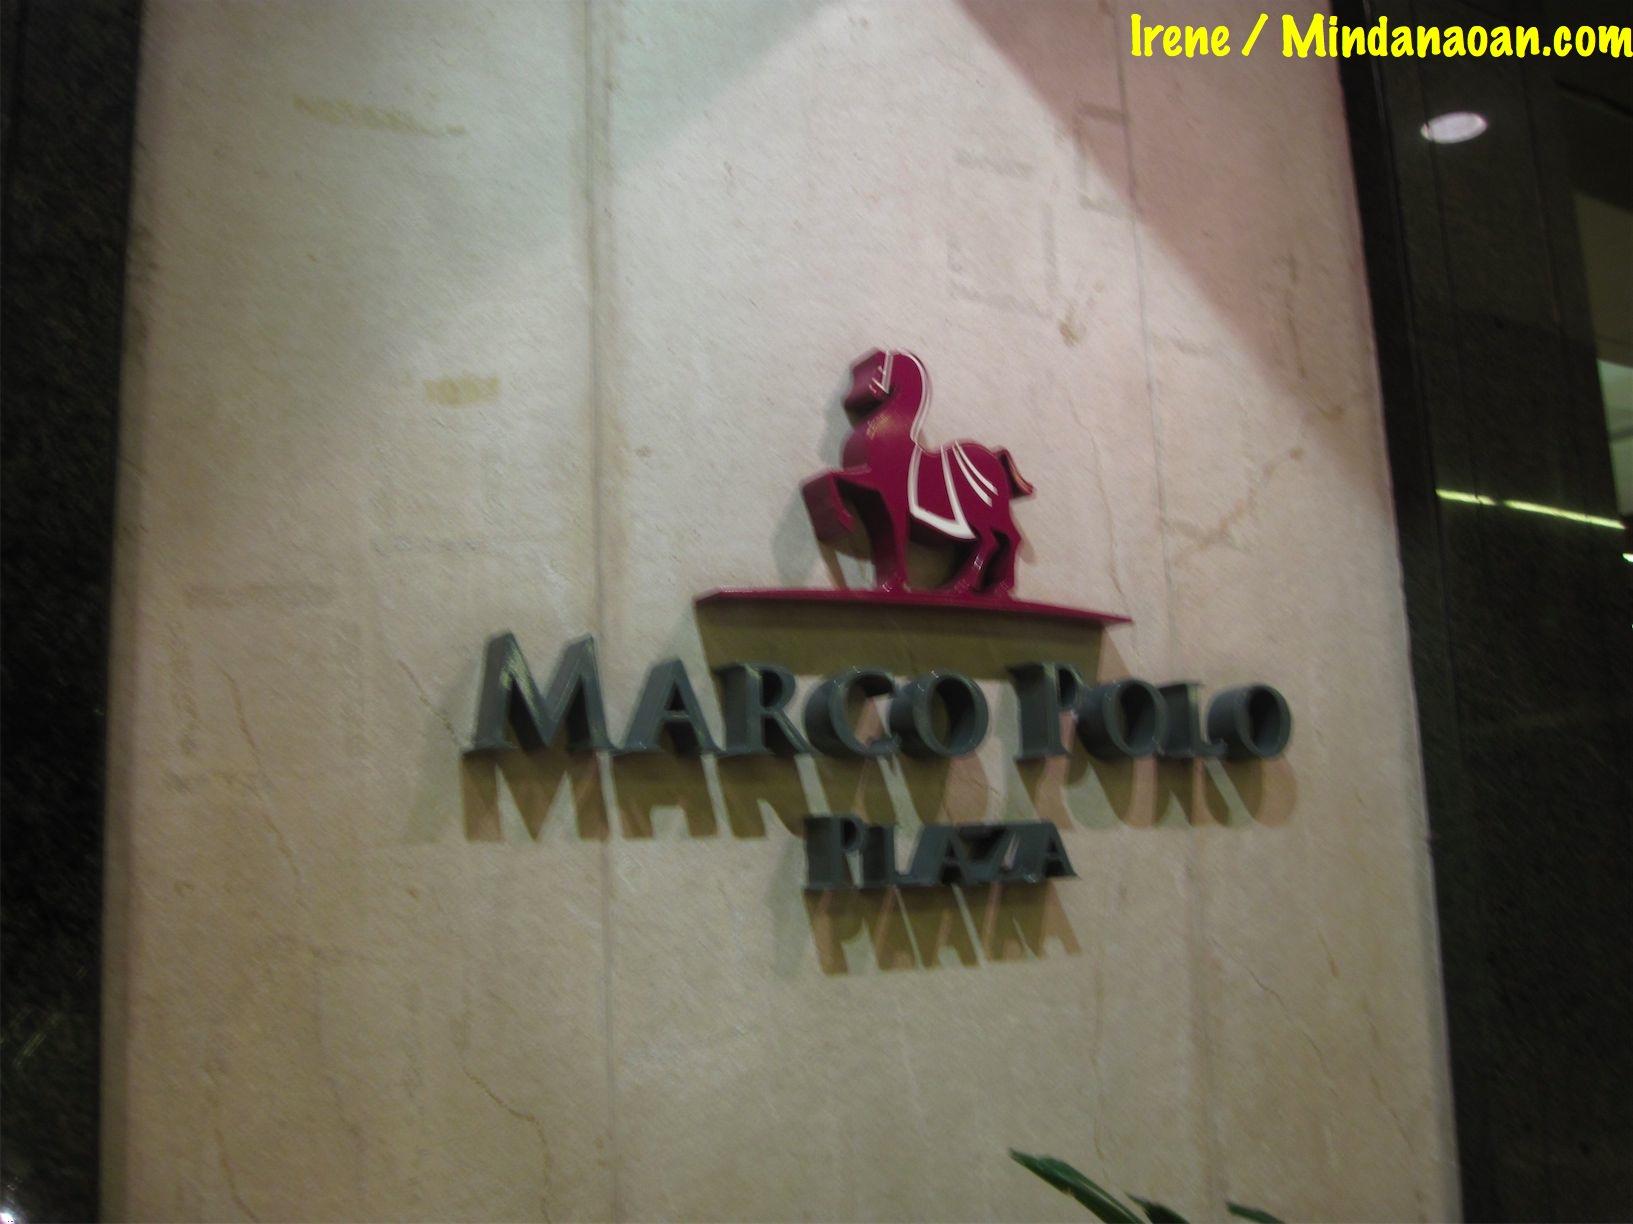 Marco Polo Plaza Cebu dinner buffet – Cafe Marco